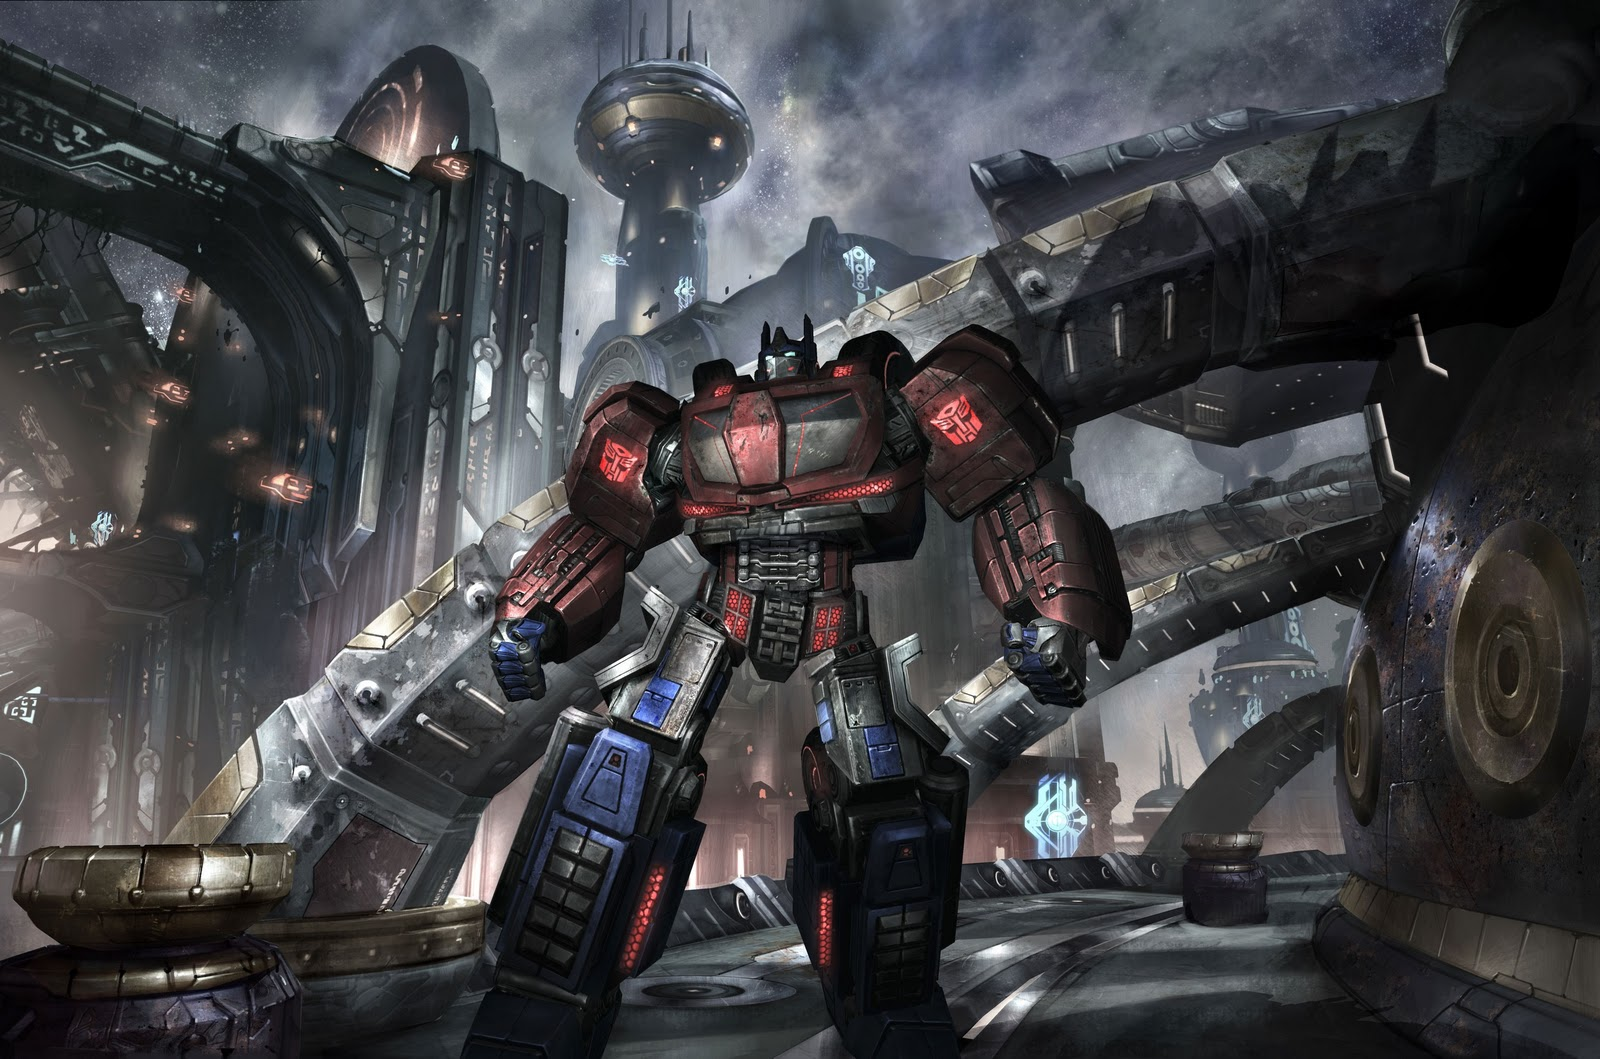 Transformers matrix wallpapers transformers prime hd - Transformers prime wallpaper ...